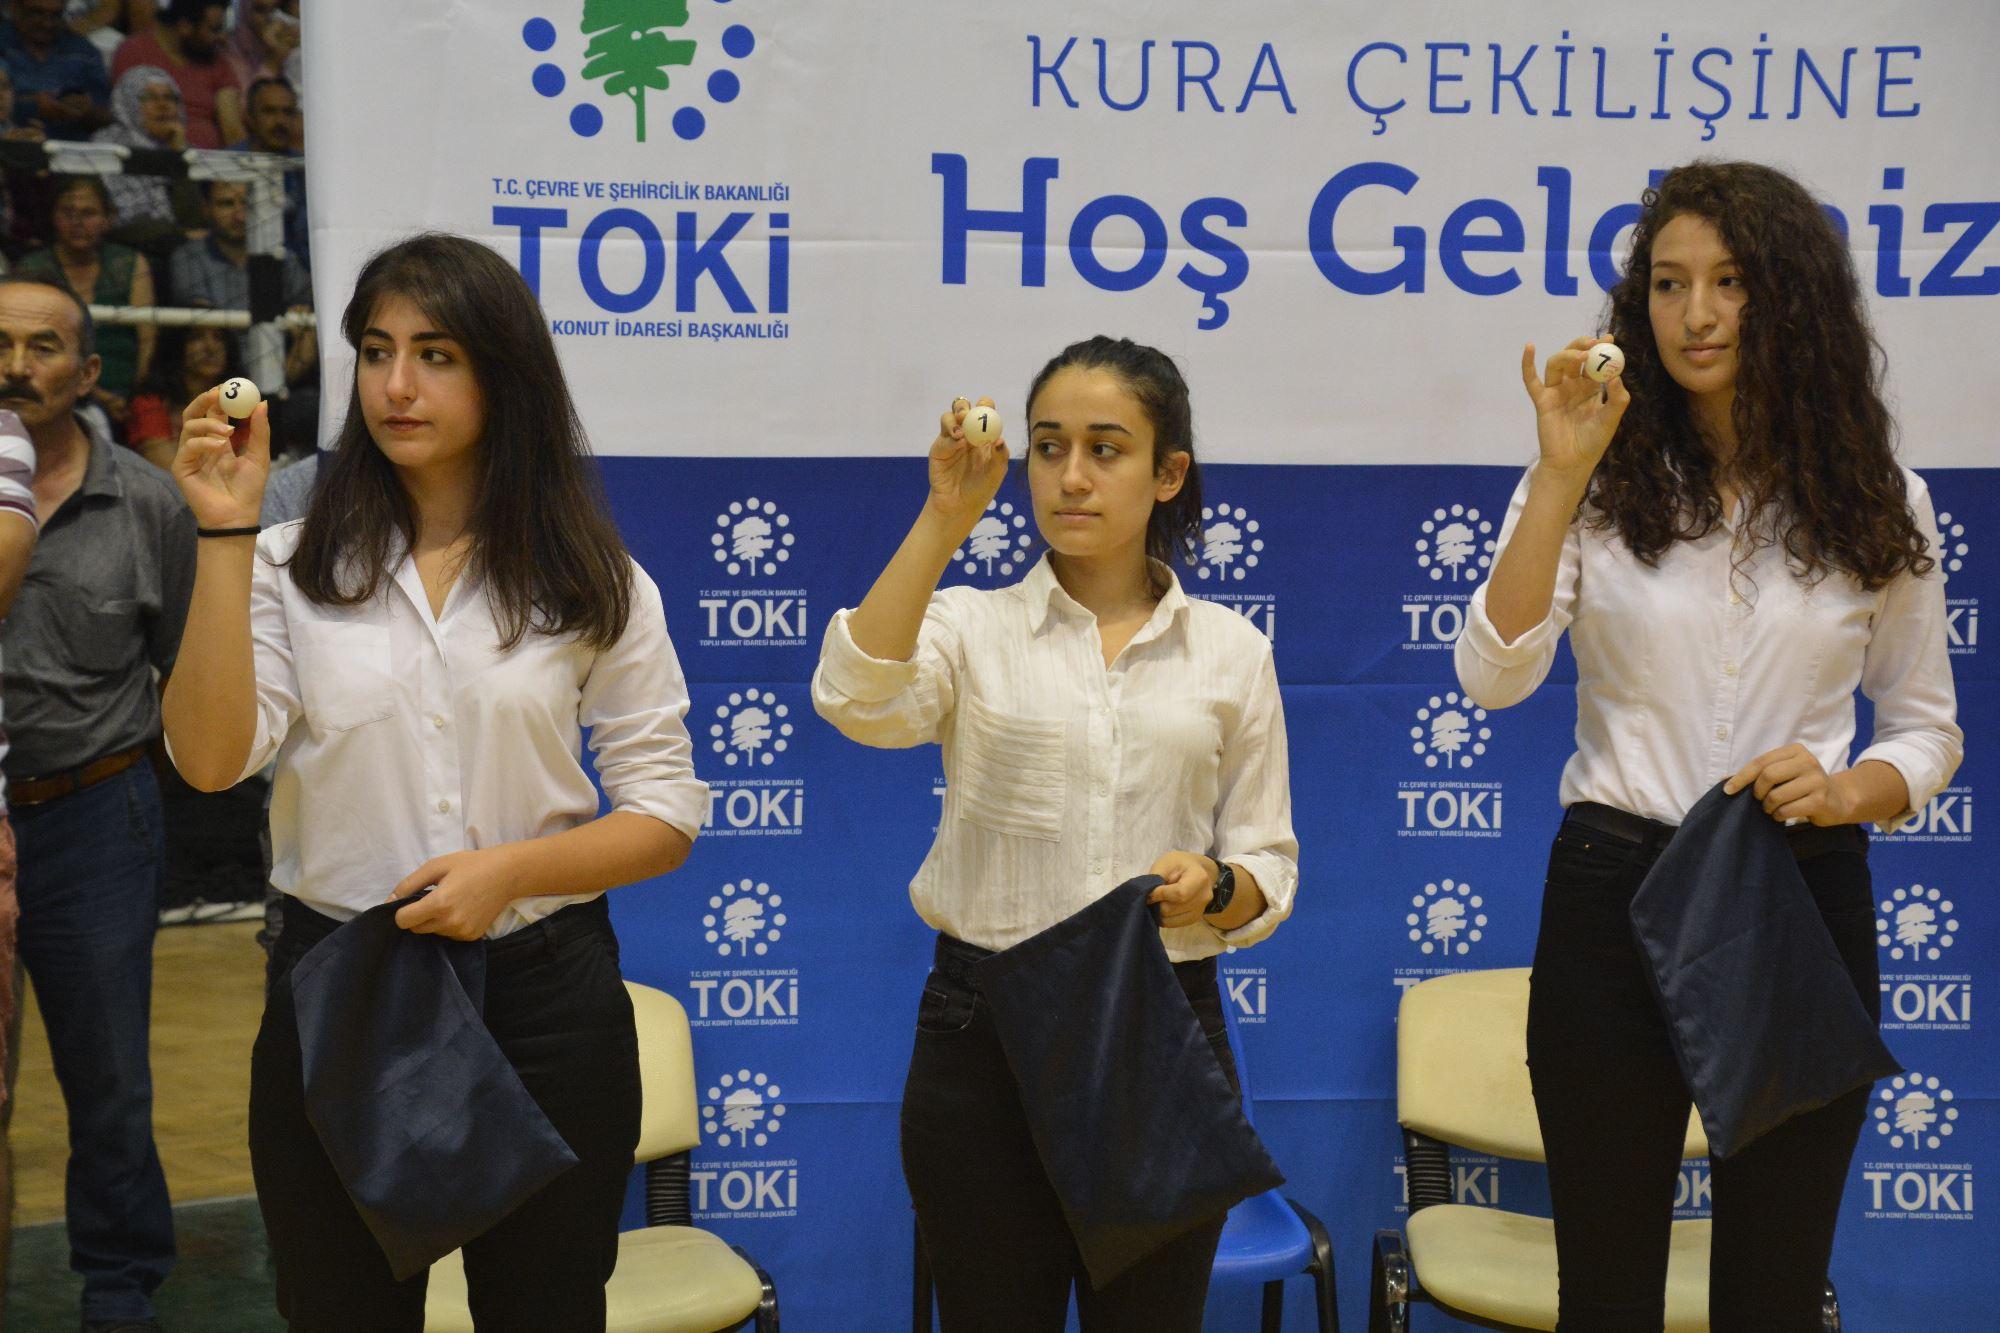 ALİAĞA TOKİ KURA TARİHİ BELLİ OLDU..